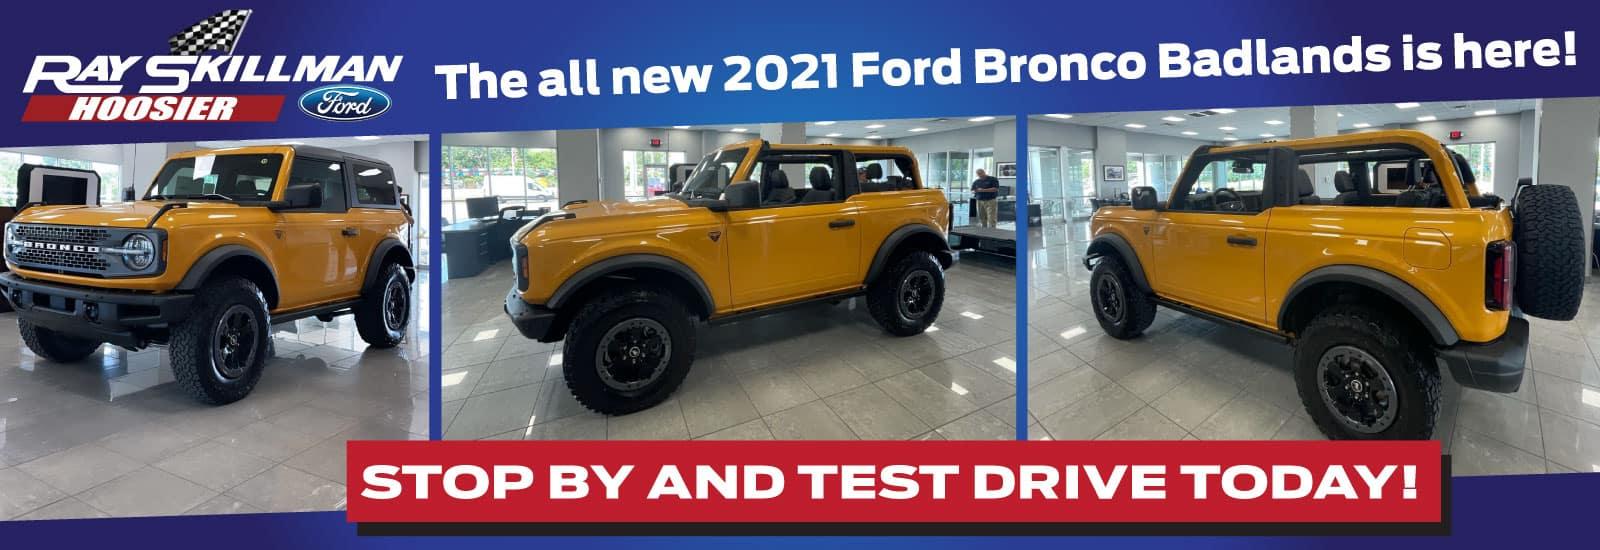 Hoosier-Ford-2021-Ford-Bronco-Web-Banner-1600×550-V1